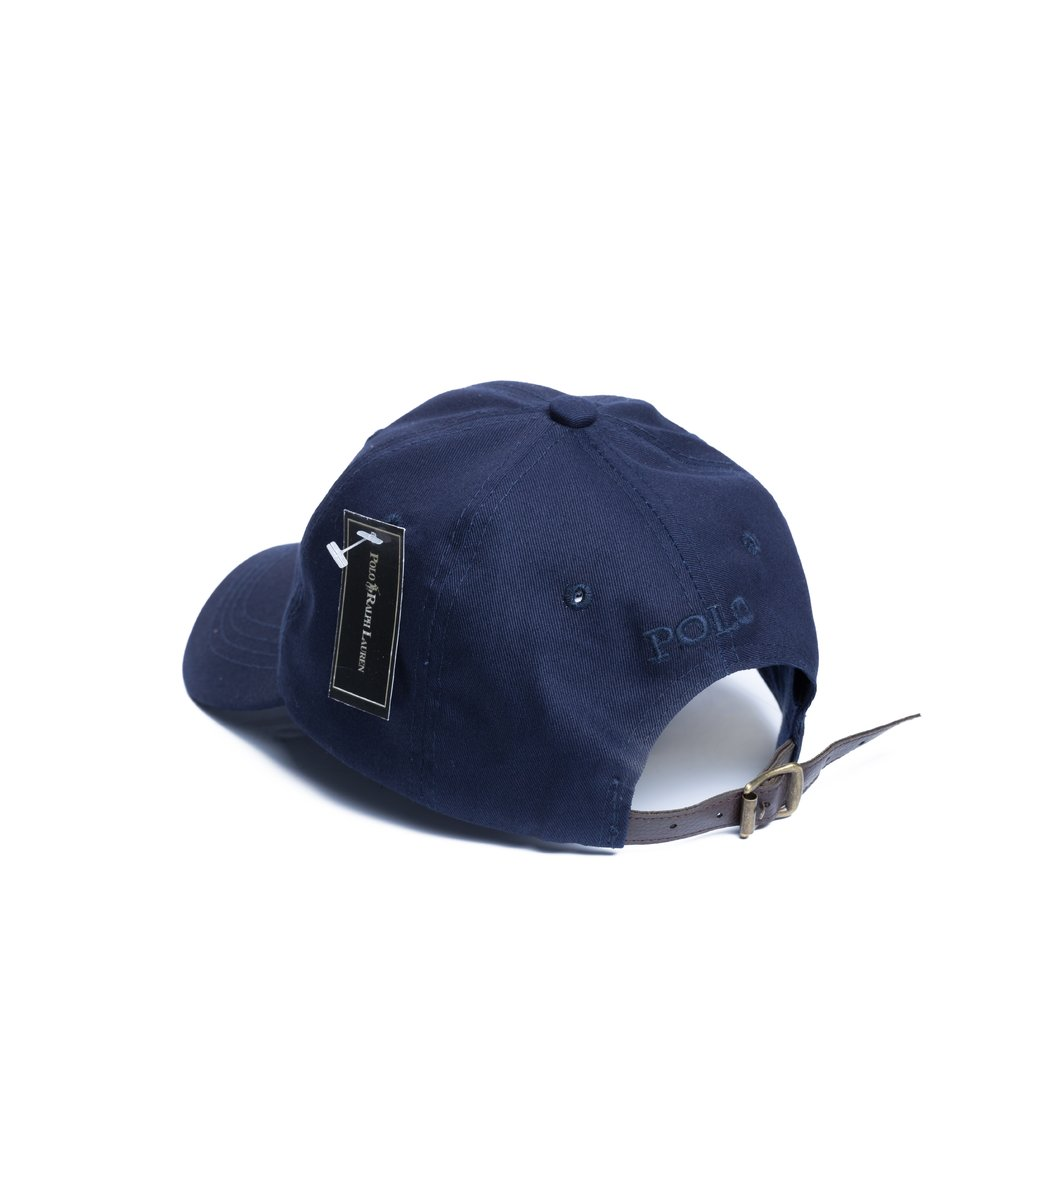 Кепка POLO Ralph Lauren Premiere Темно-синий/синий